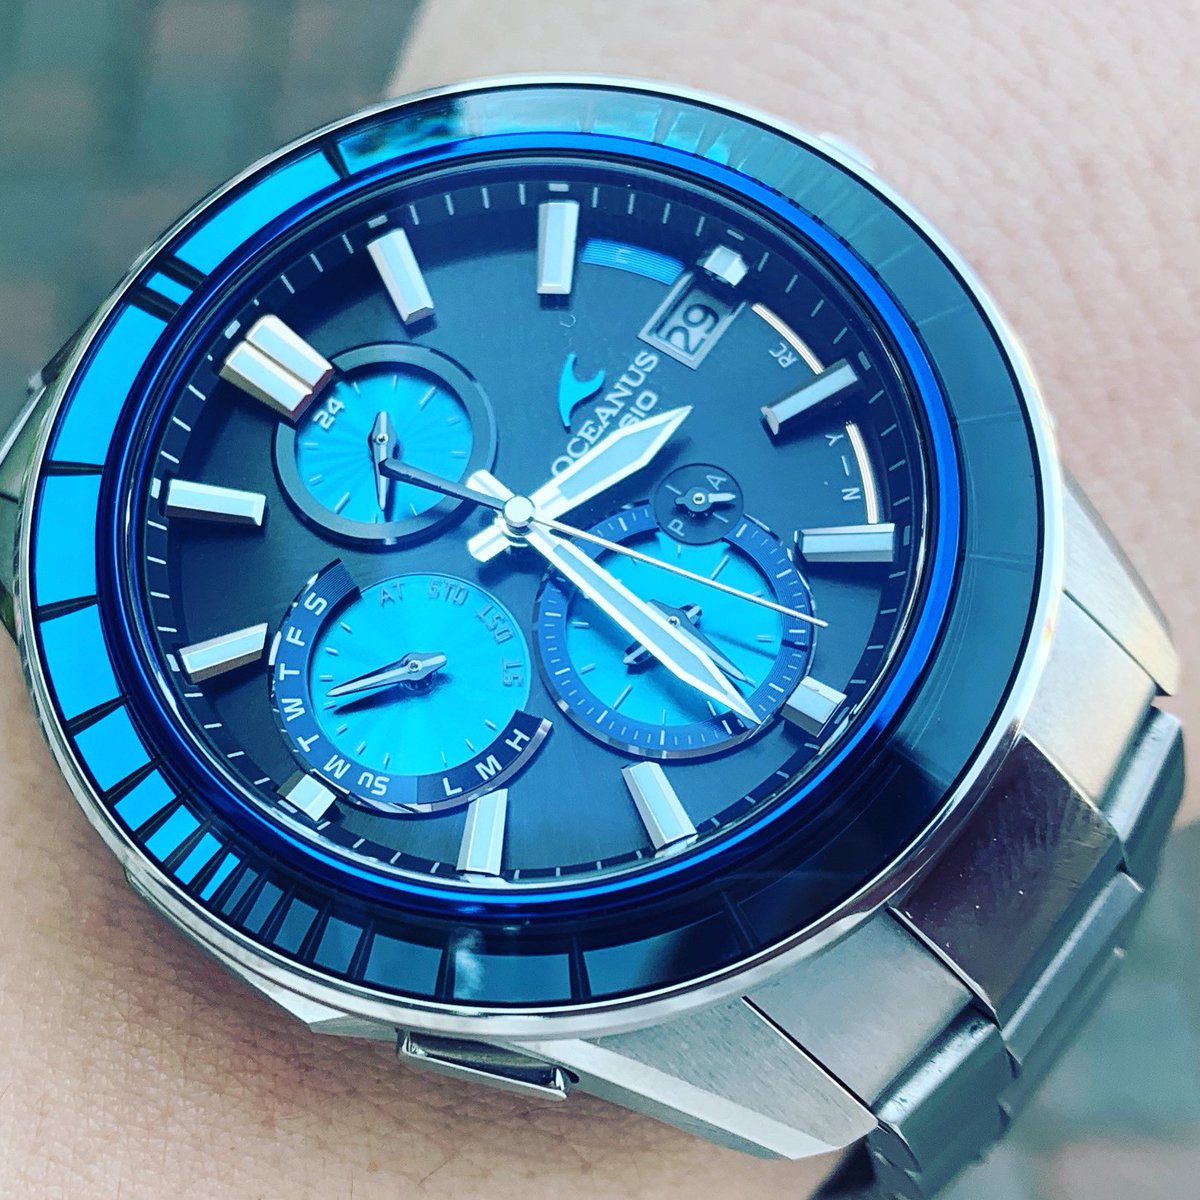 #oceanus #江戸切子 #ocws4000d   OCW-S4000D! 一目惚れしました!  江戸切子のブルーが、ヤバたん! 限定品なので、質の良い中古品を お安くゲット出来ました! https://t.co/FmJEf1MwzJ